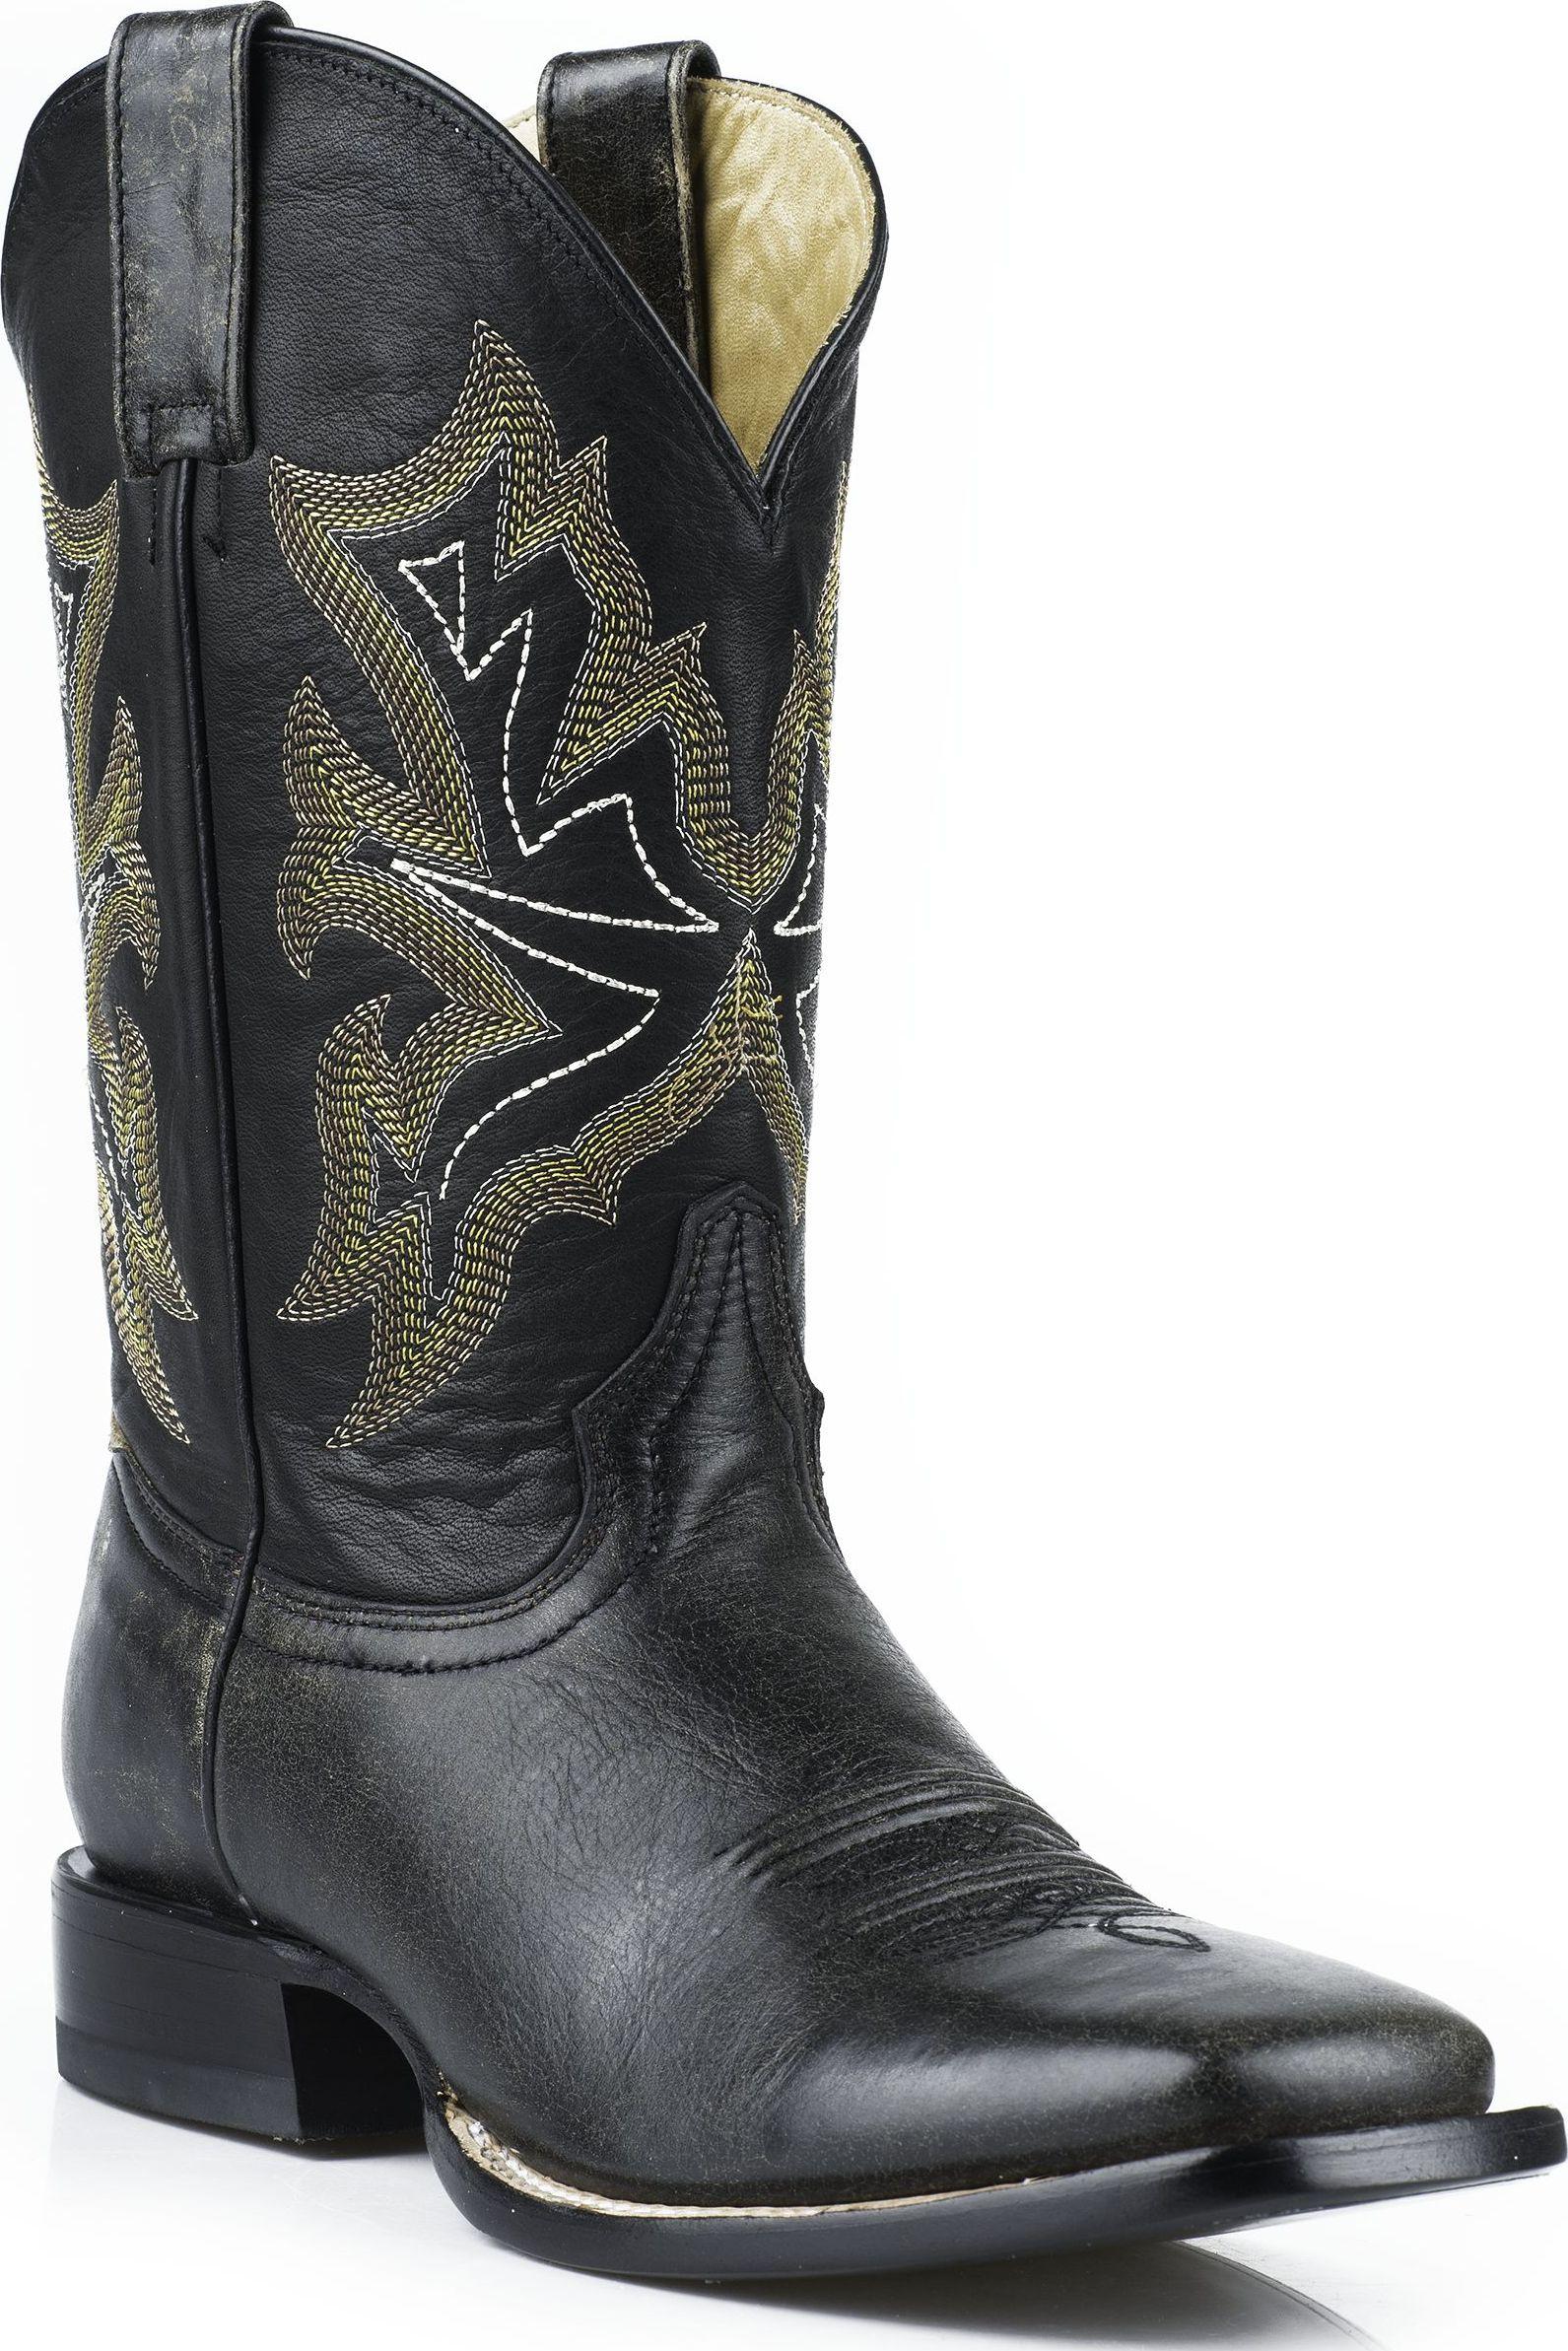 Stetson Men's Western Cowboy Boots Square Toe 0866 Black Medium (D, M) at Sears.com